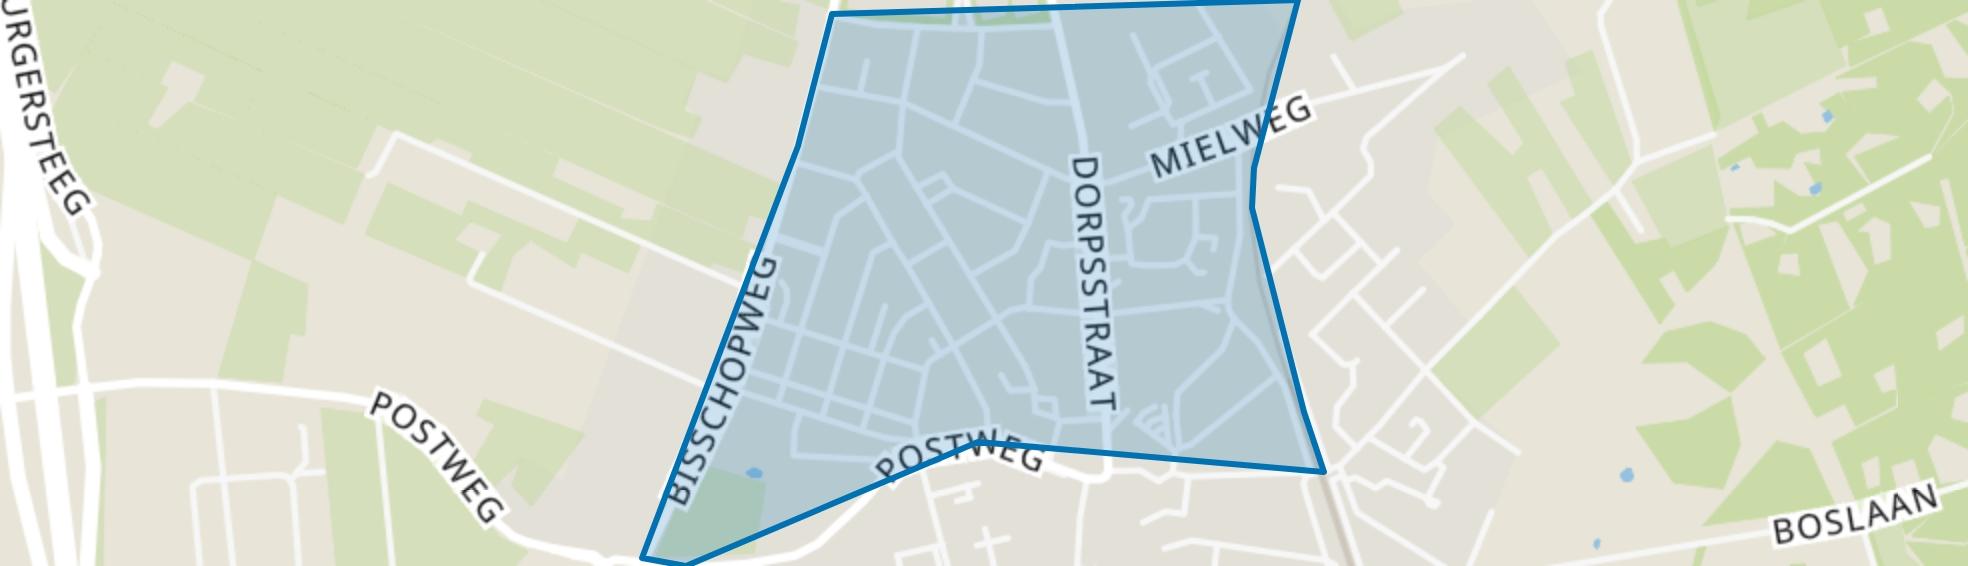 Wormshoef, Lunteren map